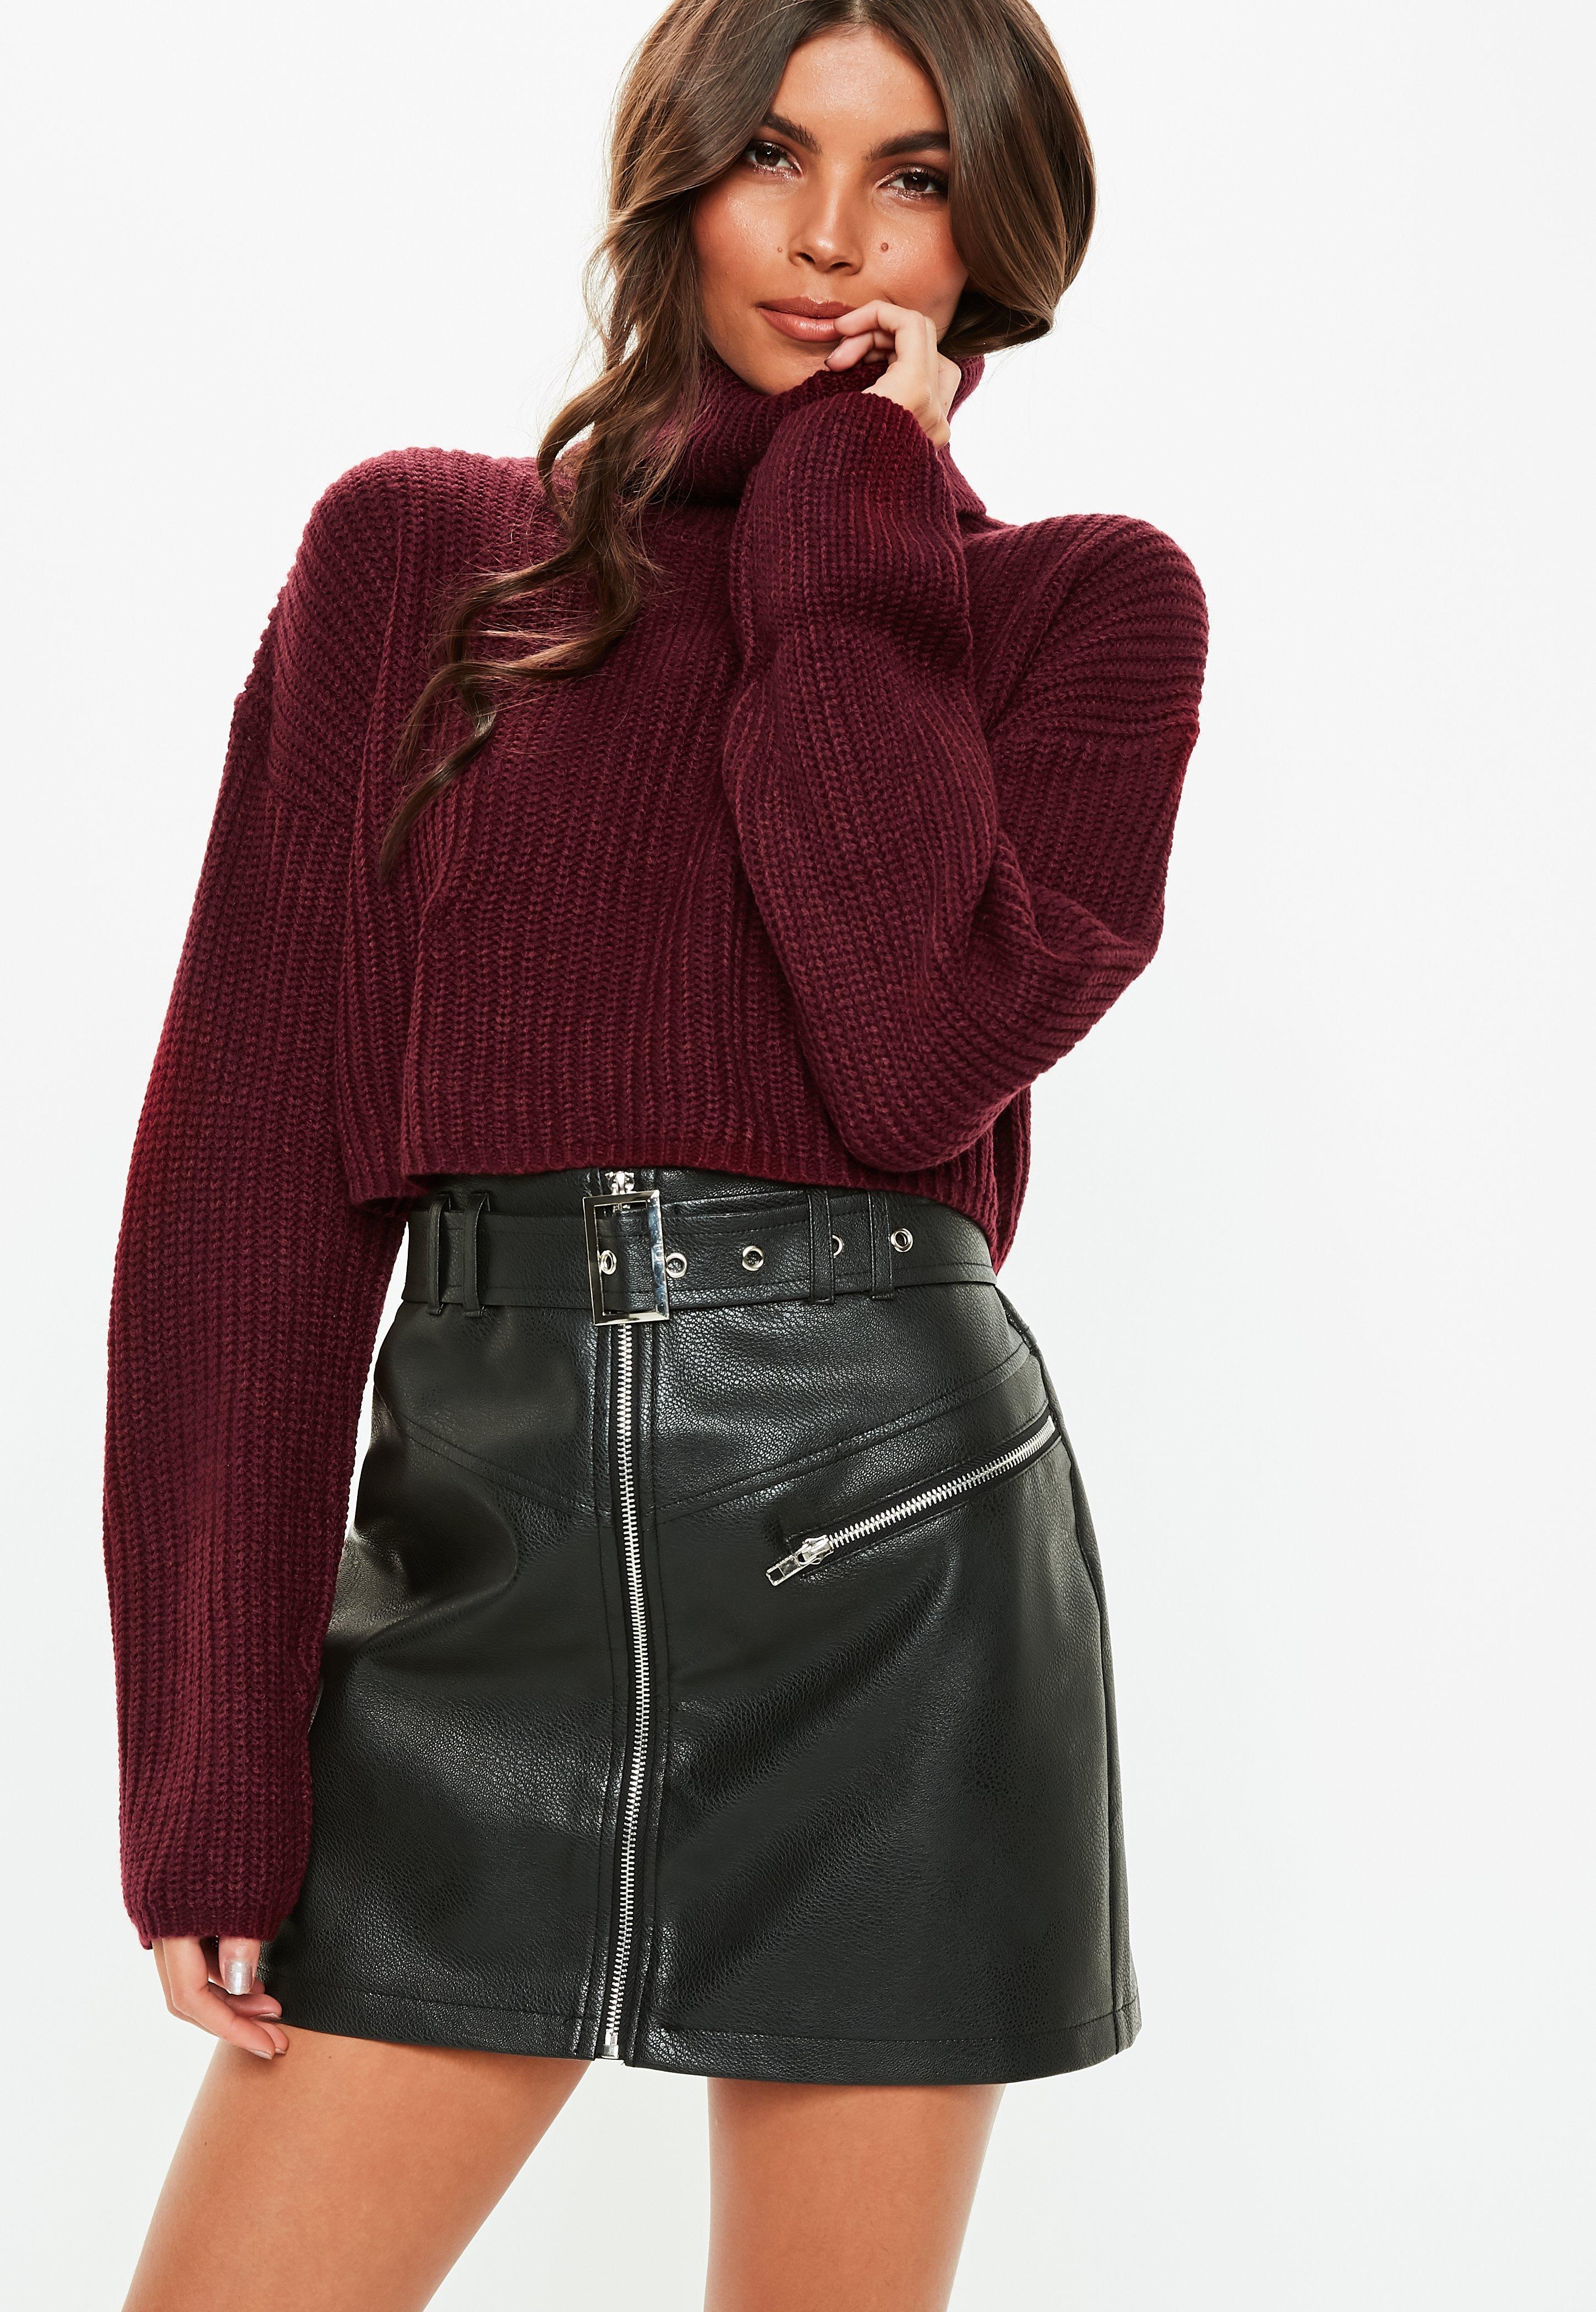 Cropped Sweaters  856e321b4